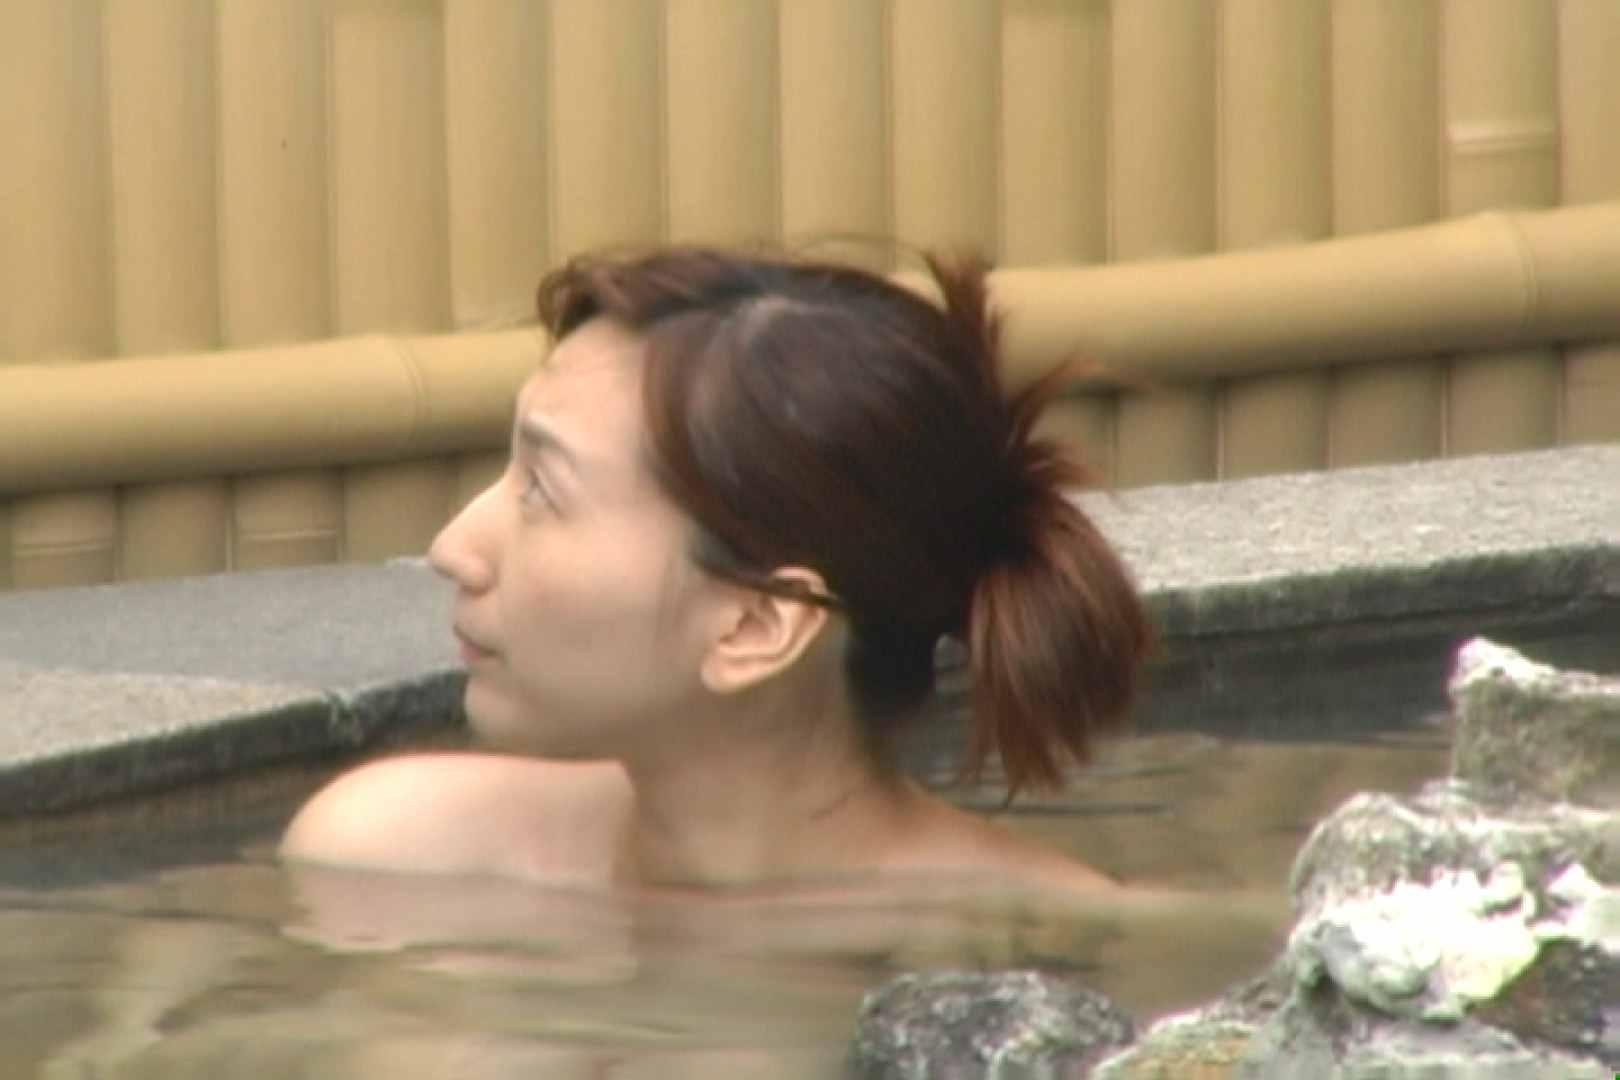 Aquaな露天風呂Vol.616 露天風呂編  89PIX 24